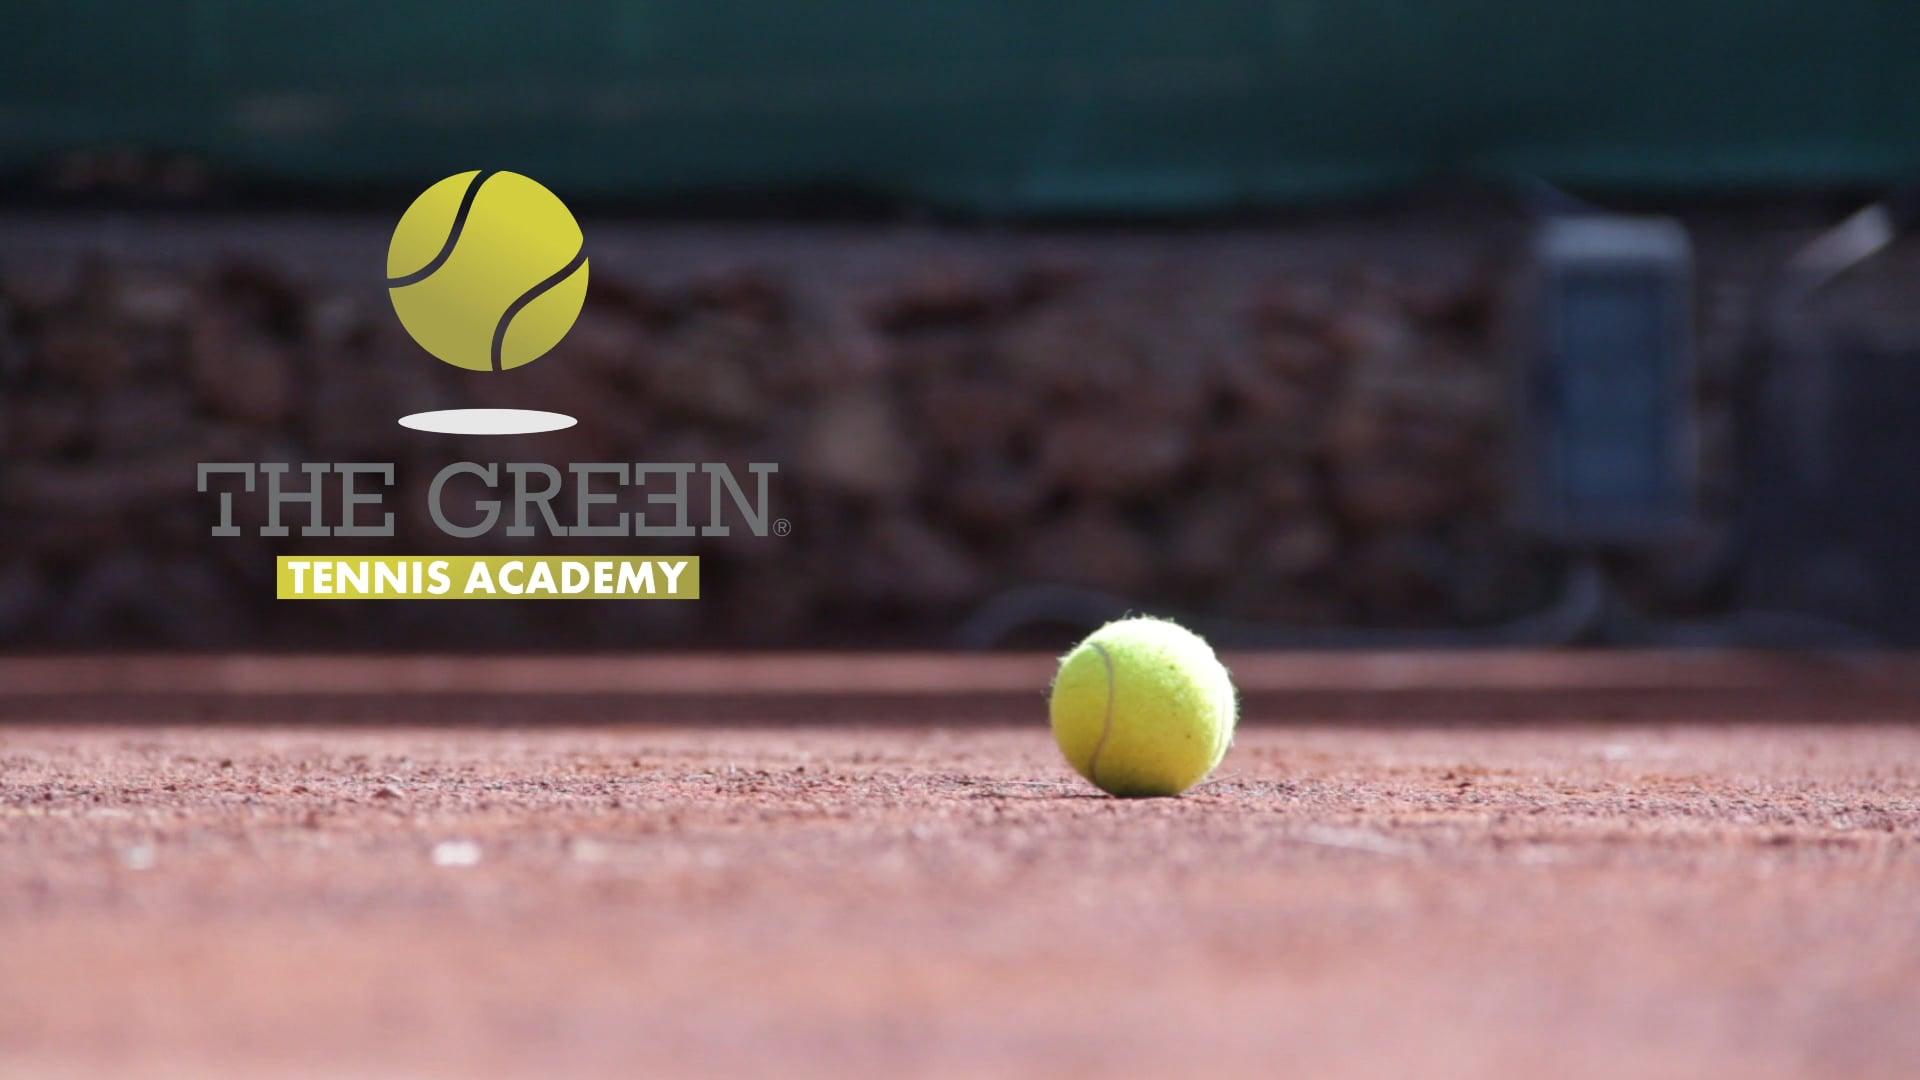 THE GREEN | TENNIS ACADEMY